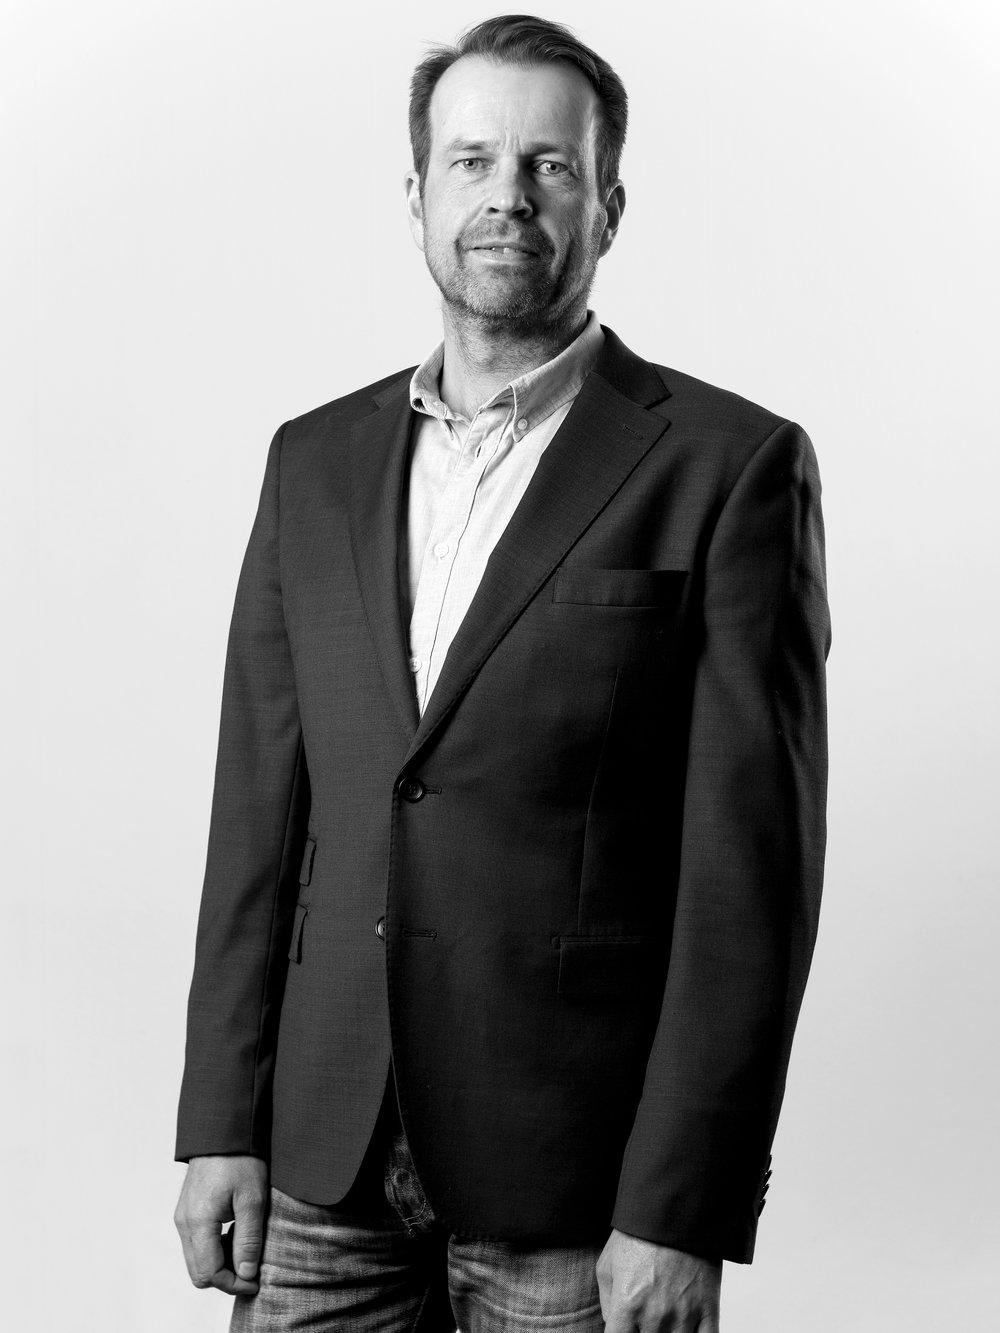 Jonas Ericsson - CEO +46 76 115 20 97jonas.ericsson@ecpairtech.se